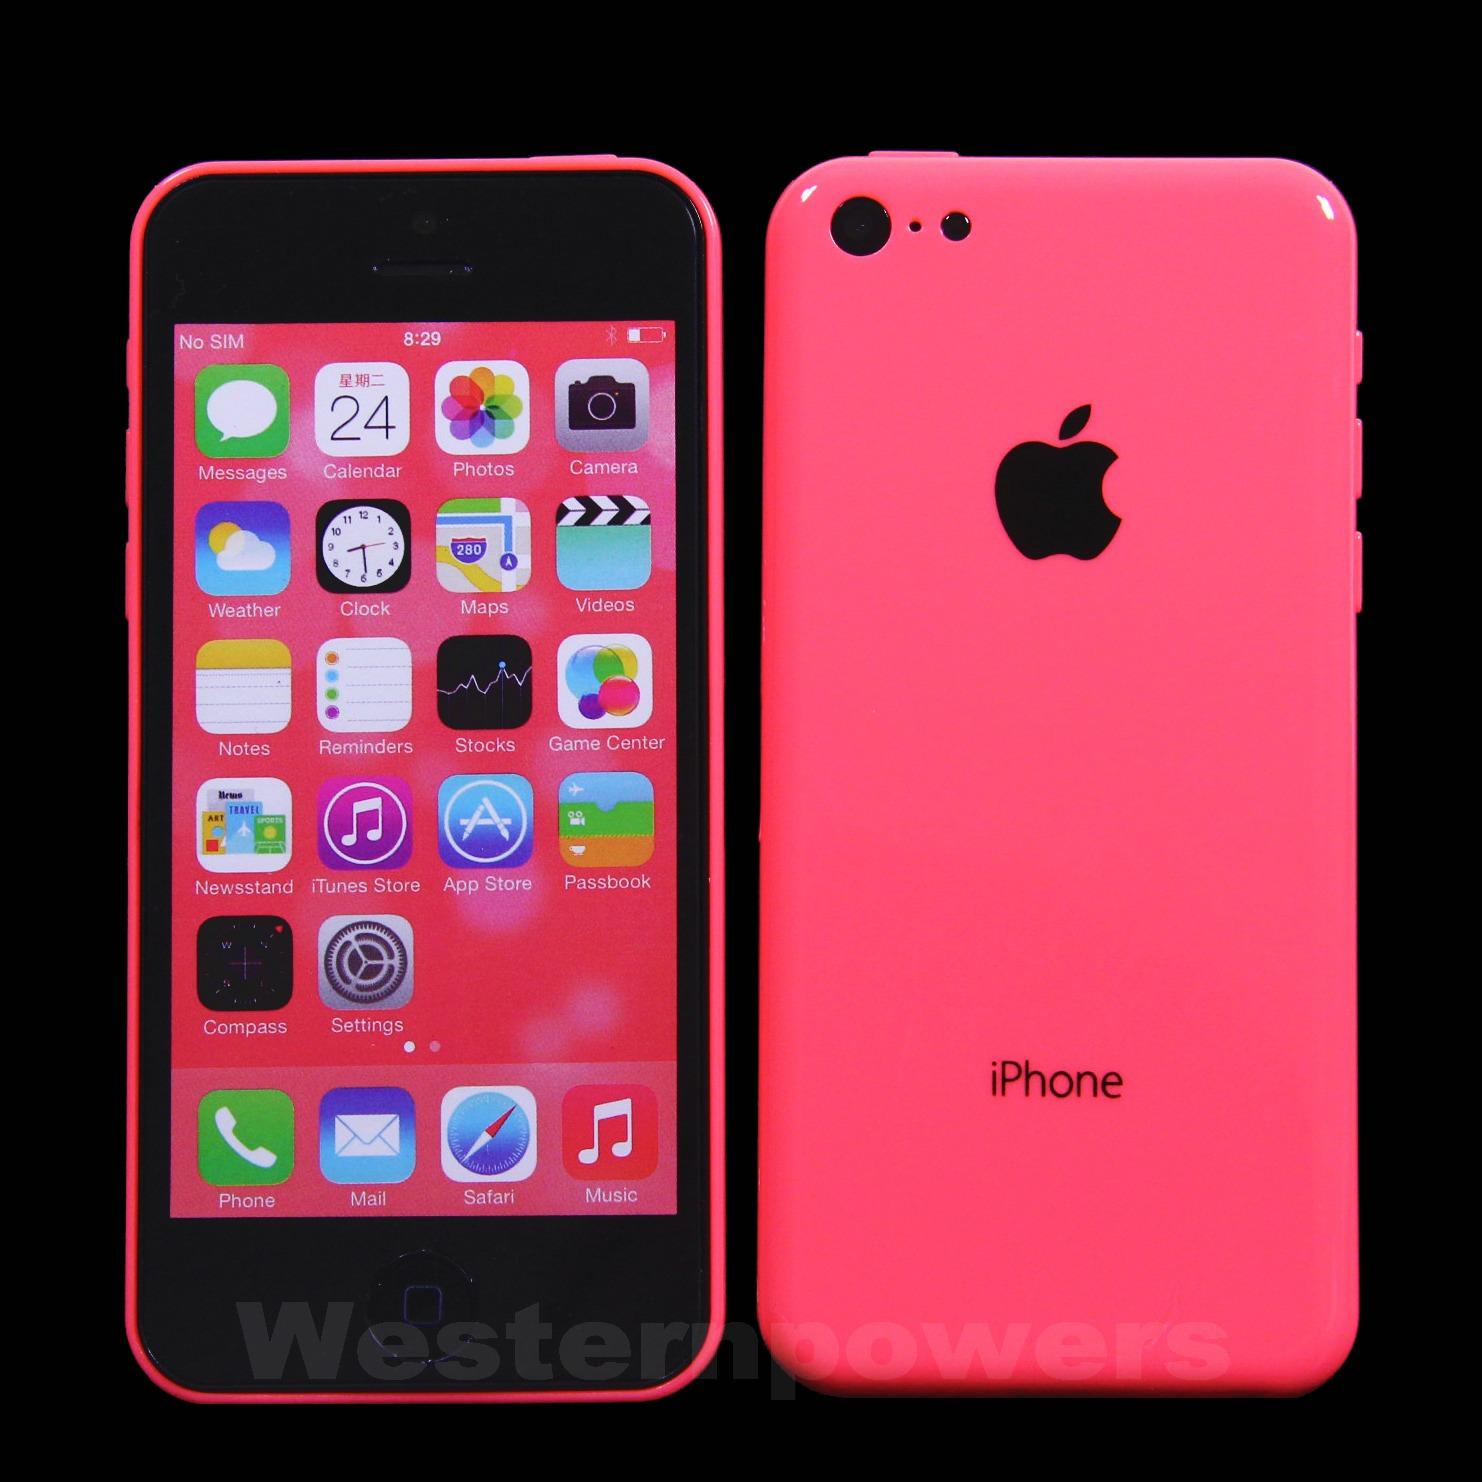 Pink iphone 5c dummy phone display phone fake toy not work usa seller